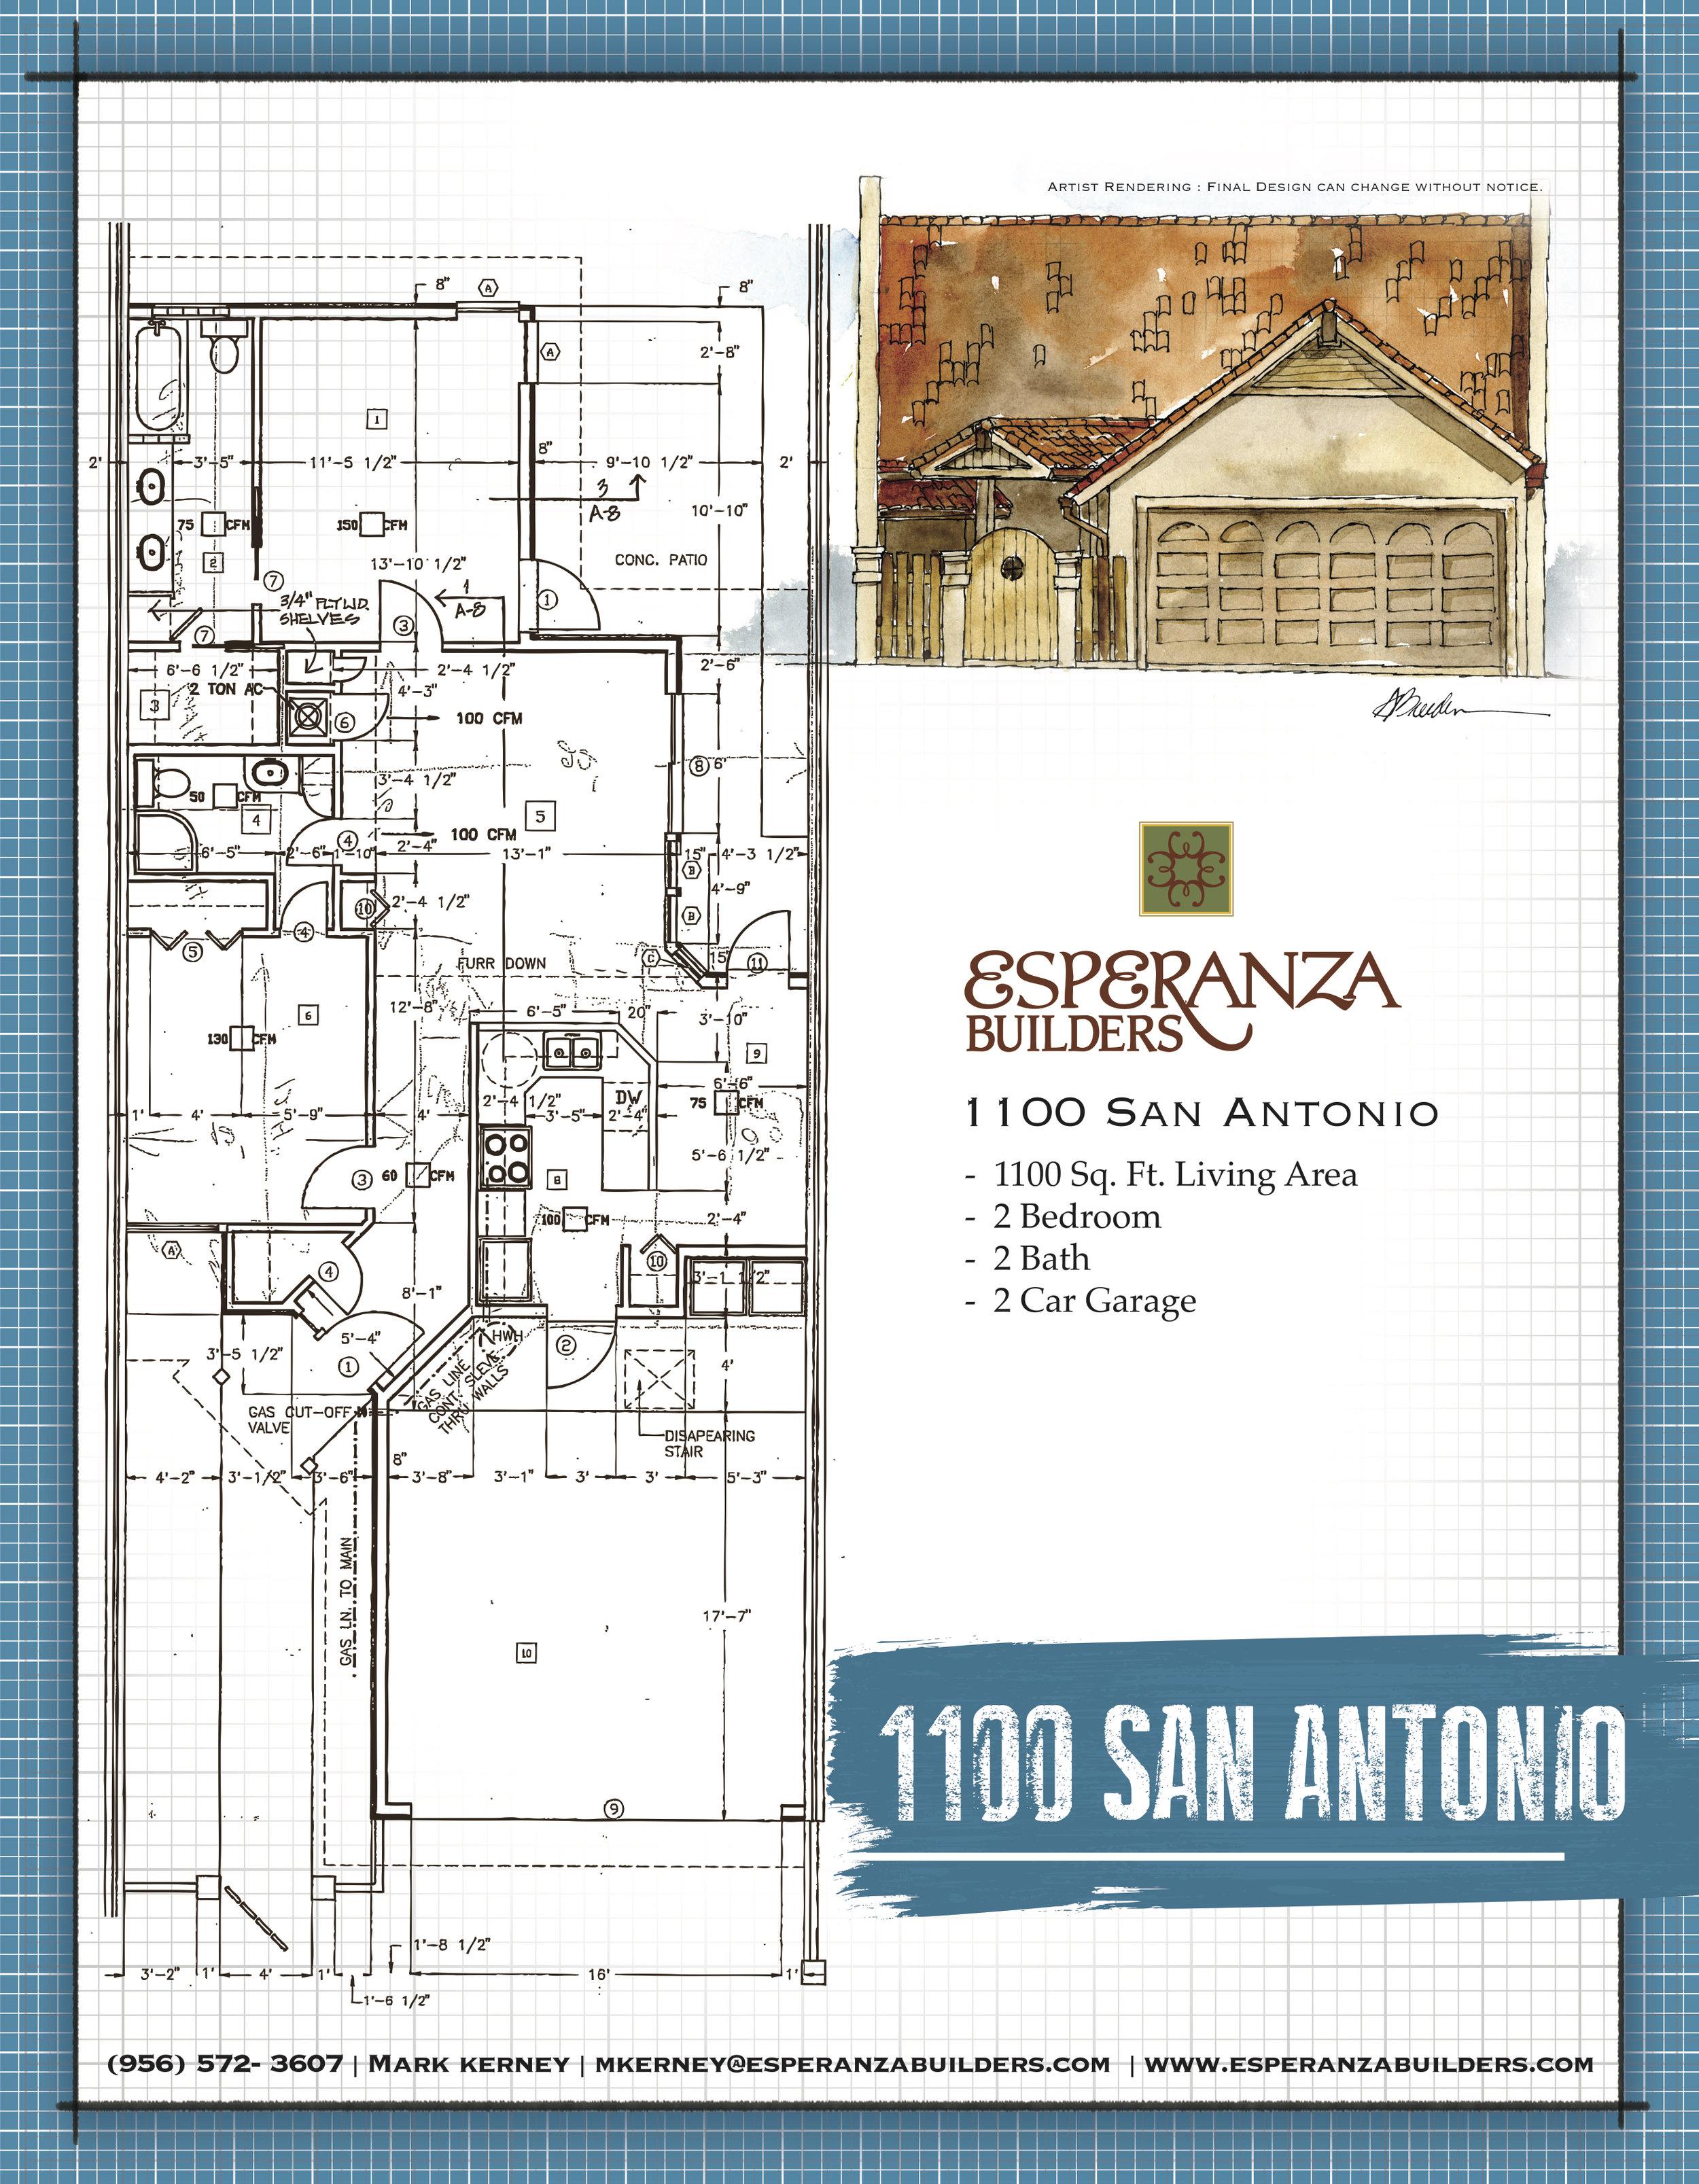 0119-07 Esperanza Group 8x5 Insert BG-1100-SanAntonio copy.jpg